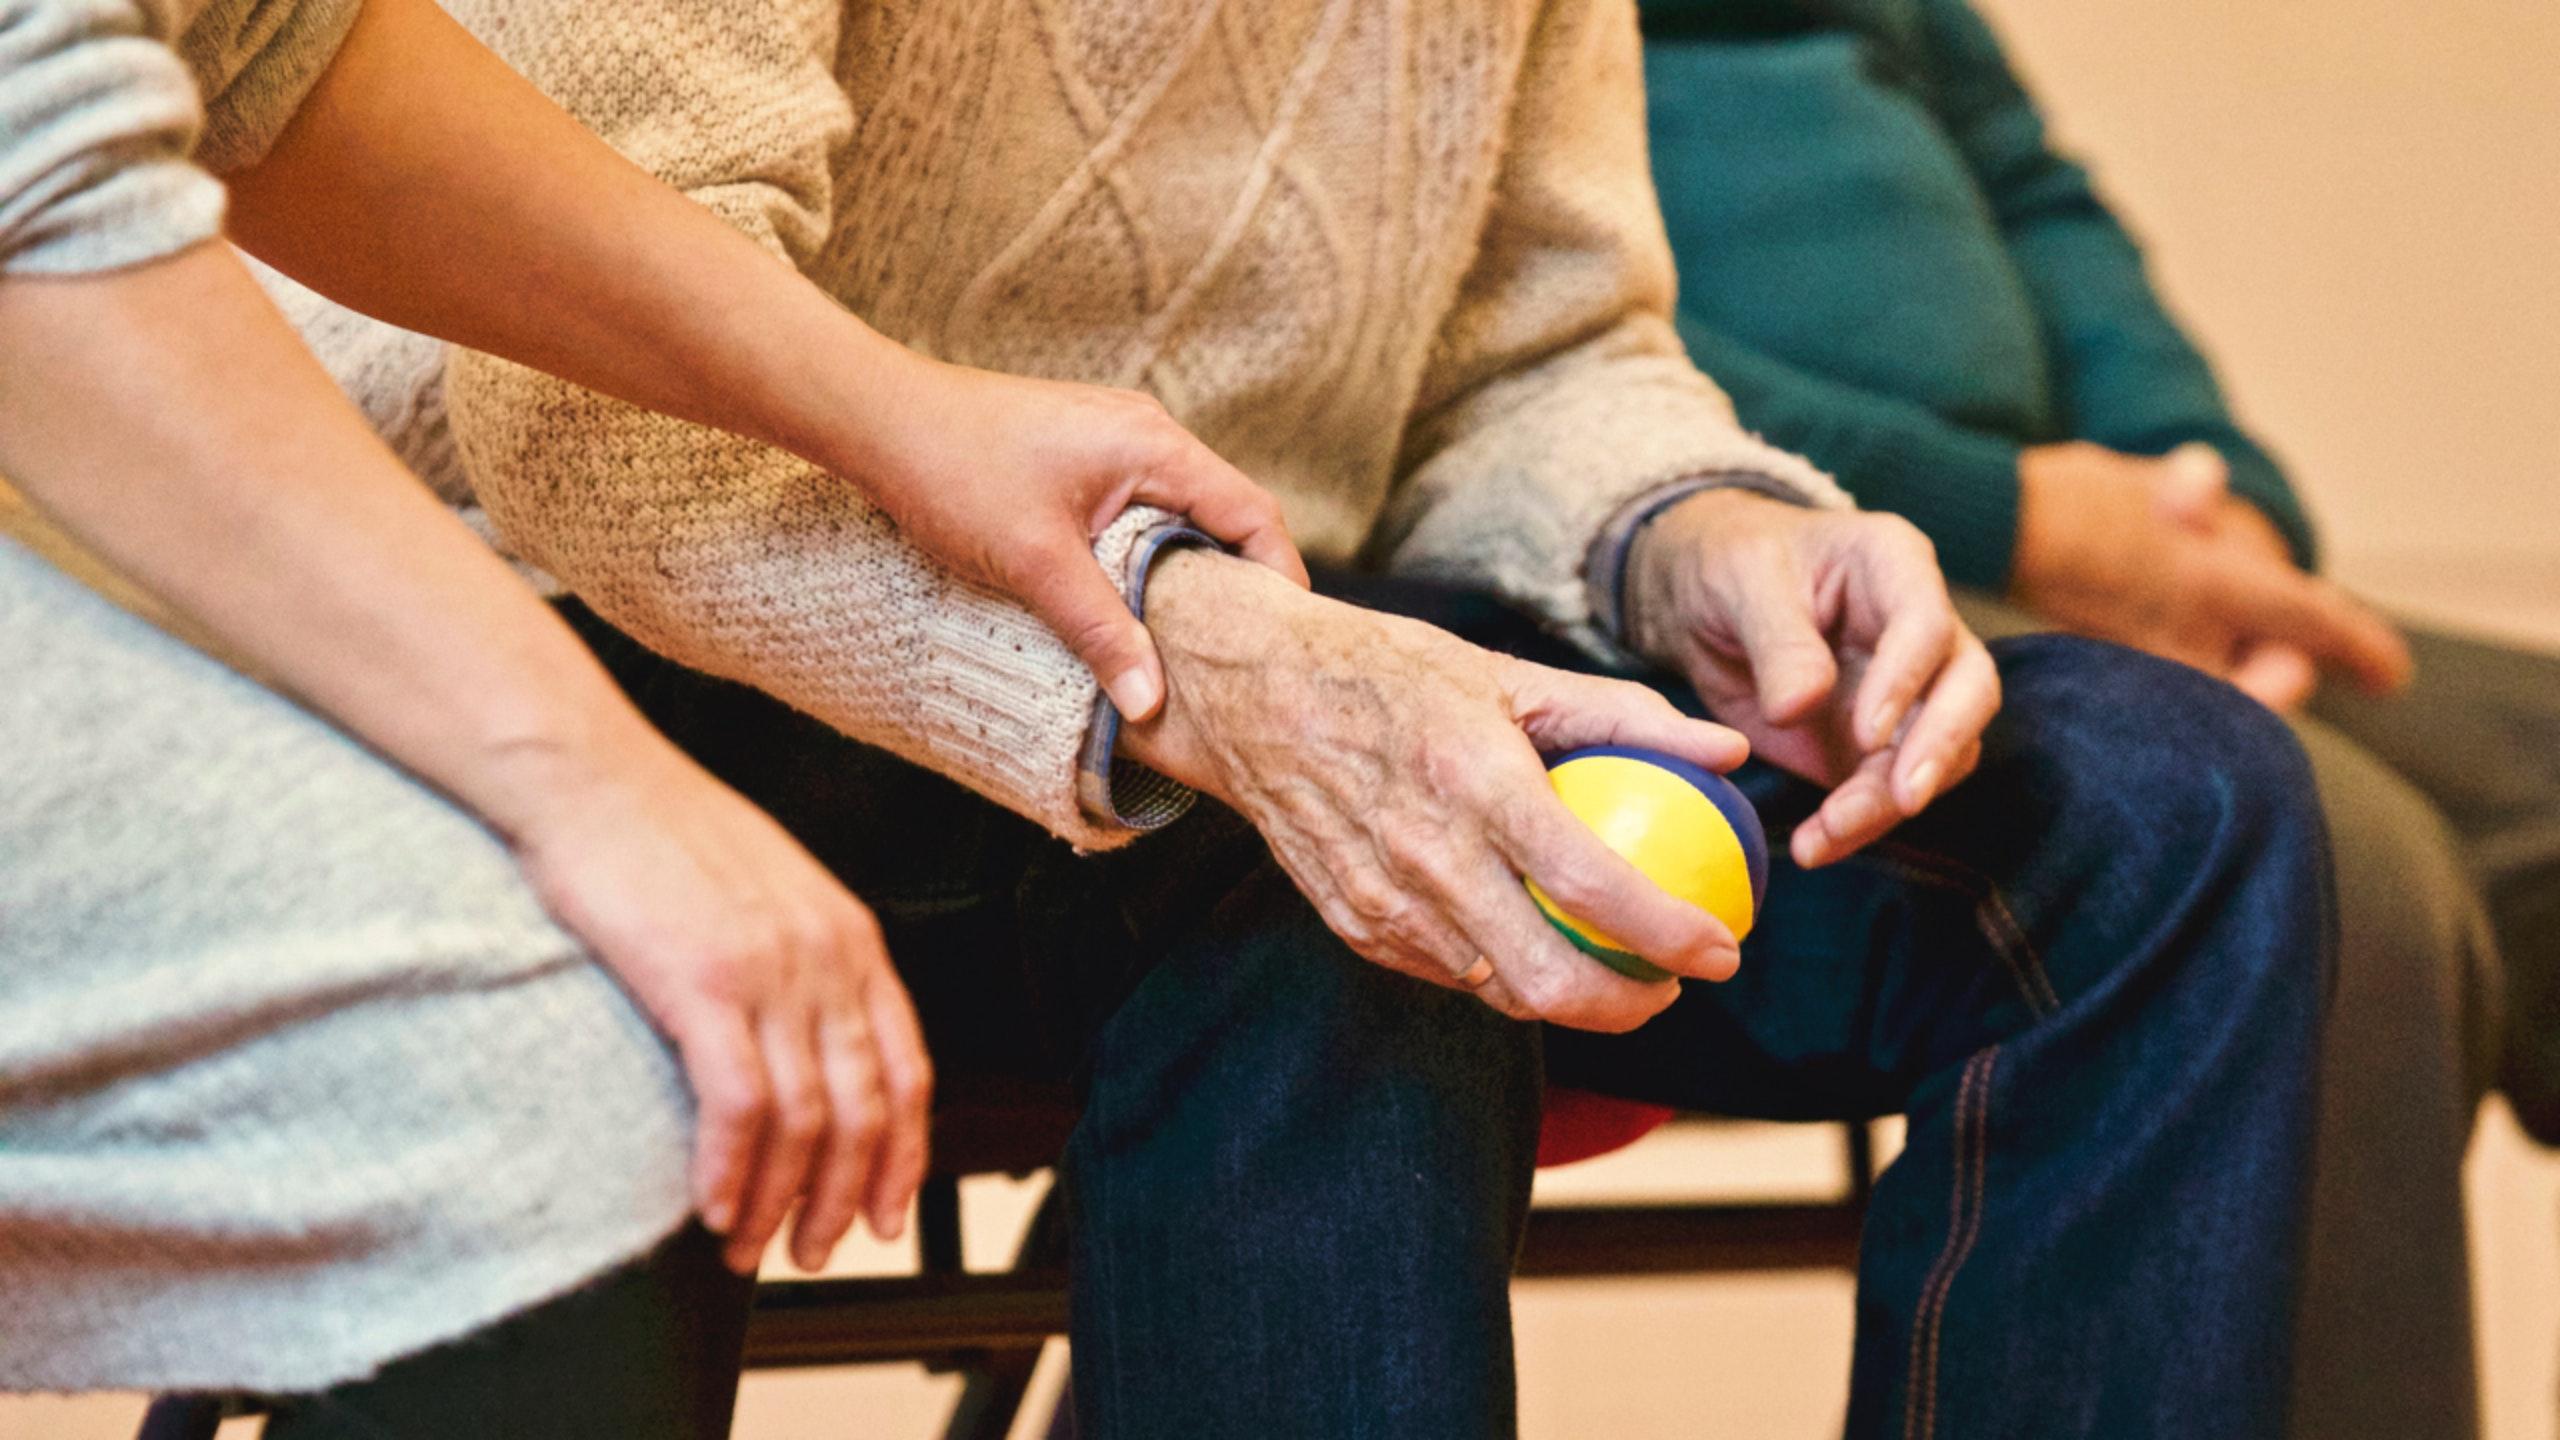 5-tips-for-effective-long-distance-caregiving